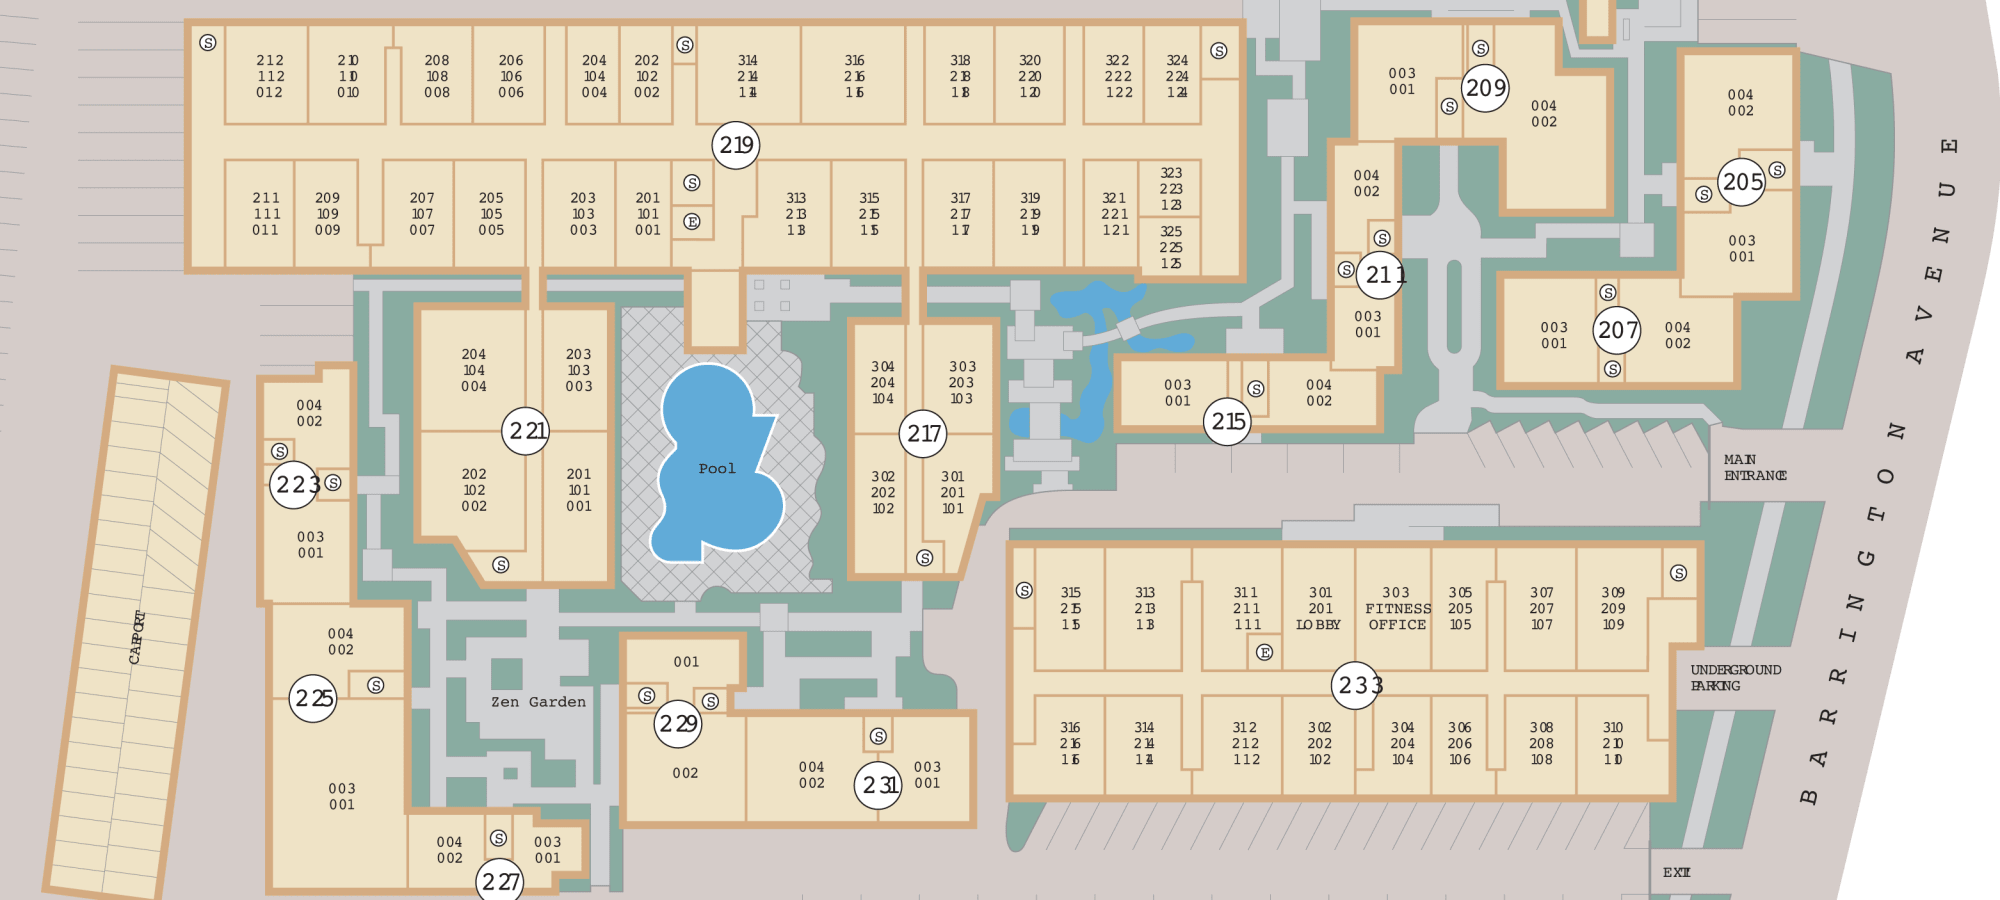 Site plan for Sunset Barrington Gardens in Los Angeles, California